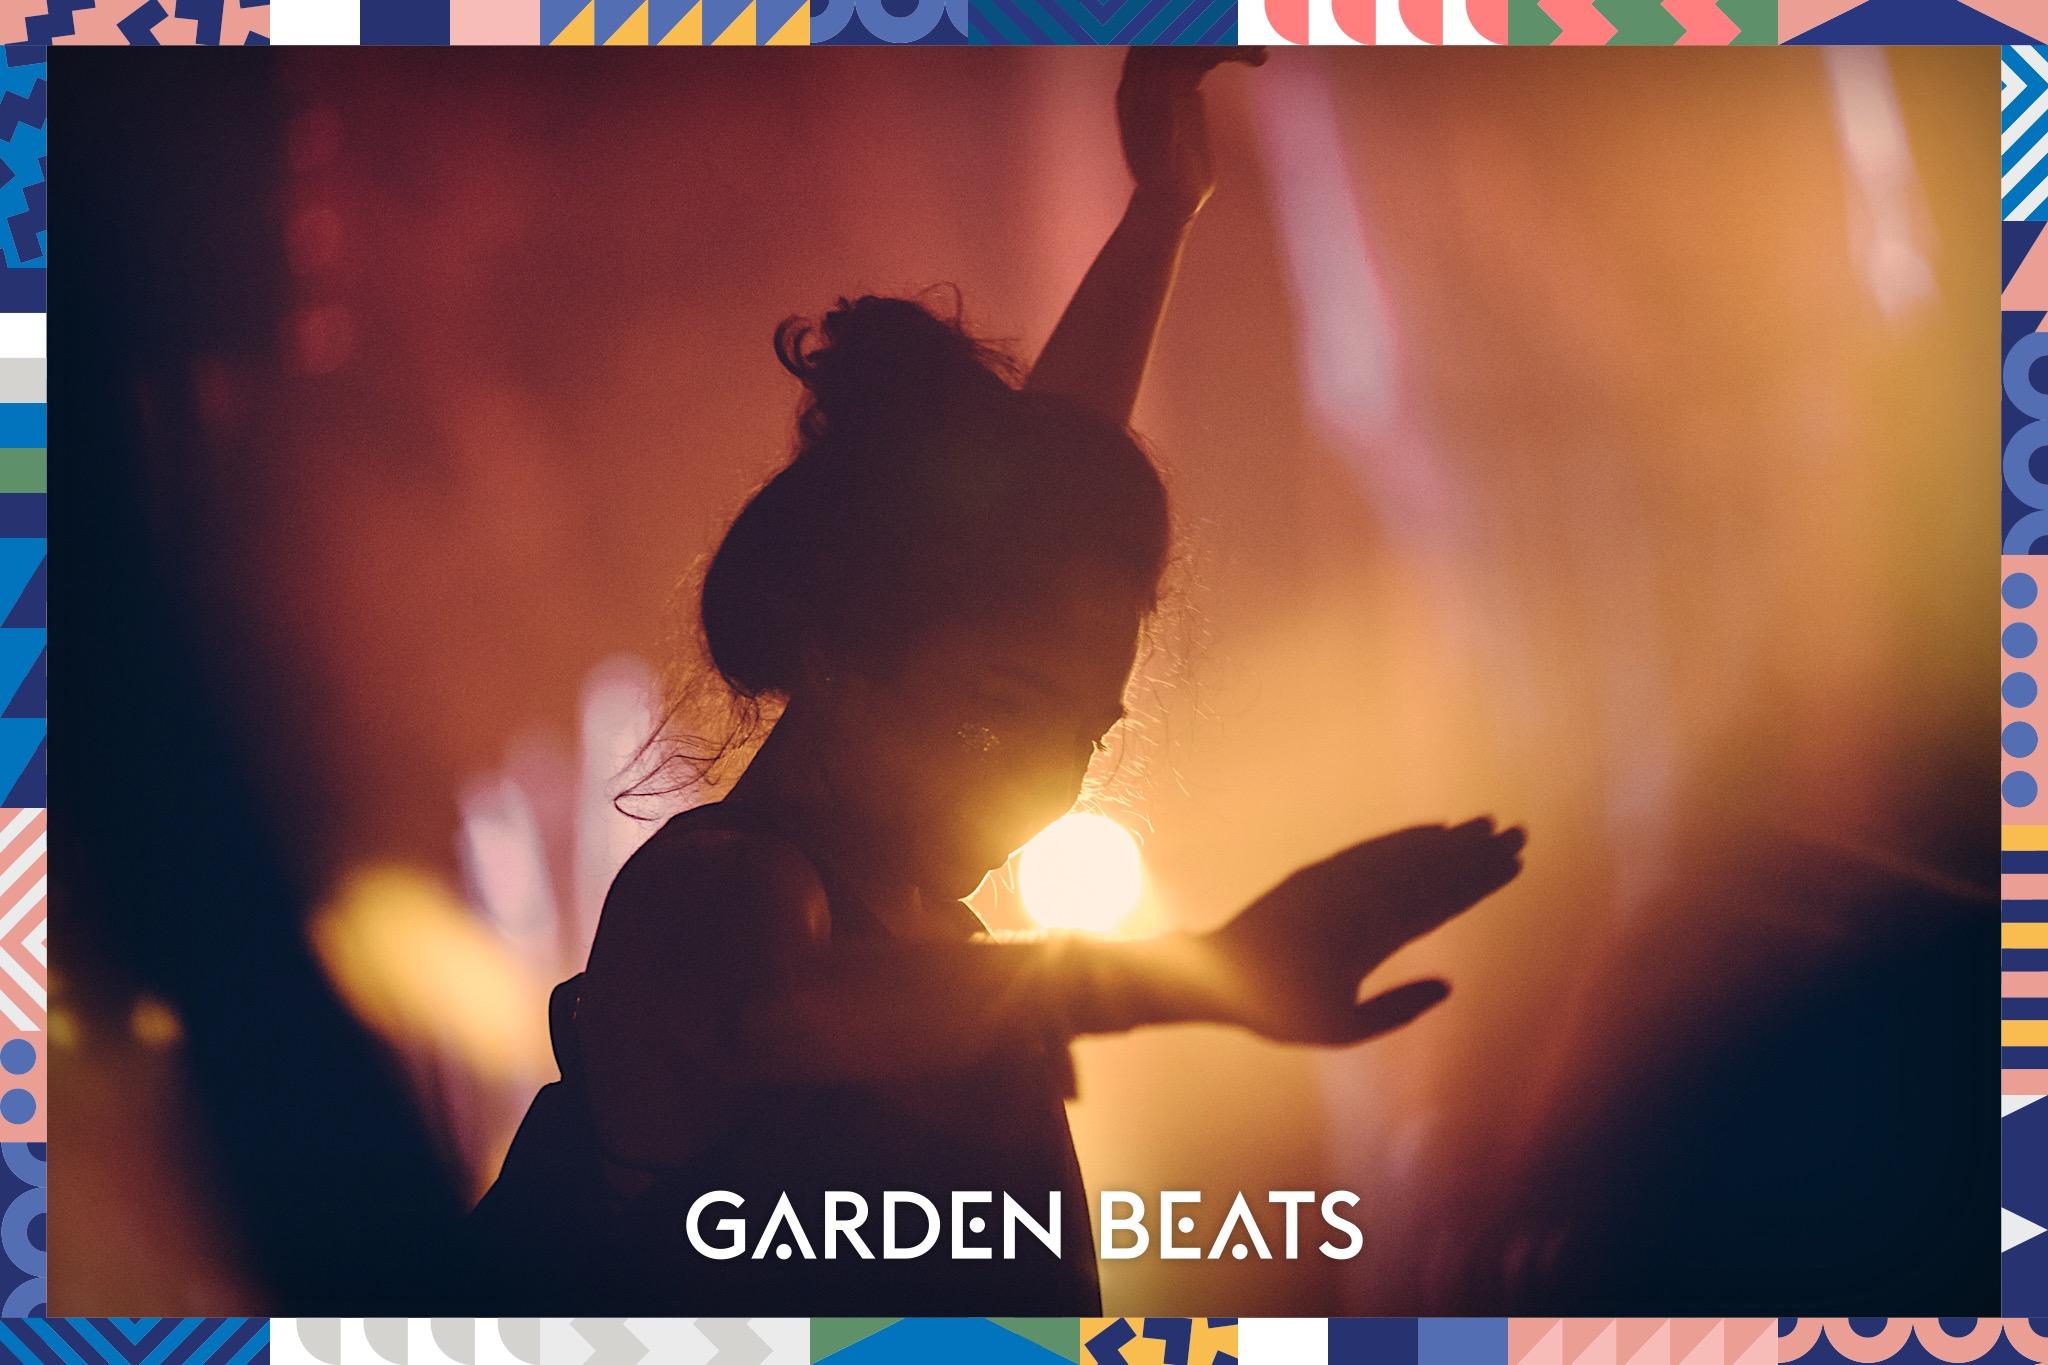 18032017_GardenBeats_Colossal779_WatermarkedGB.jpg